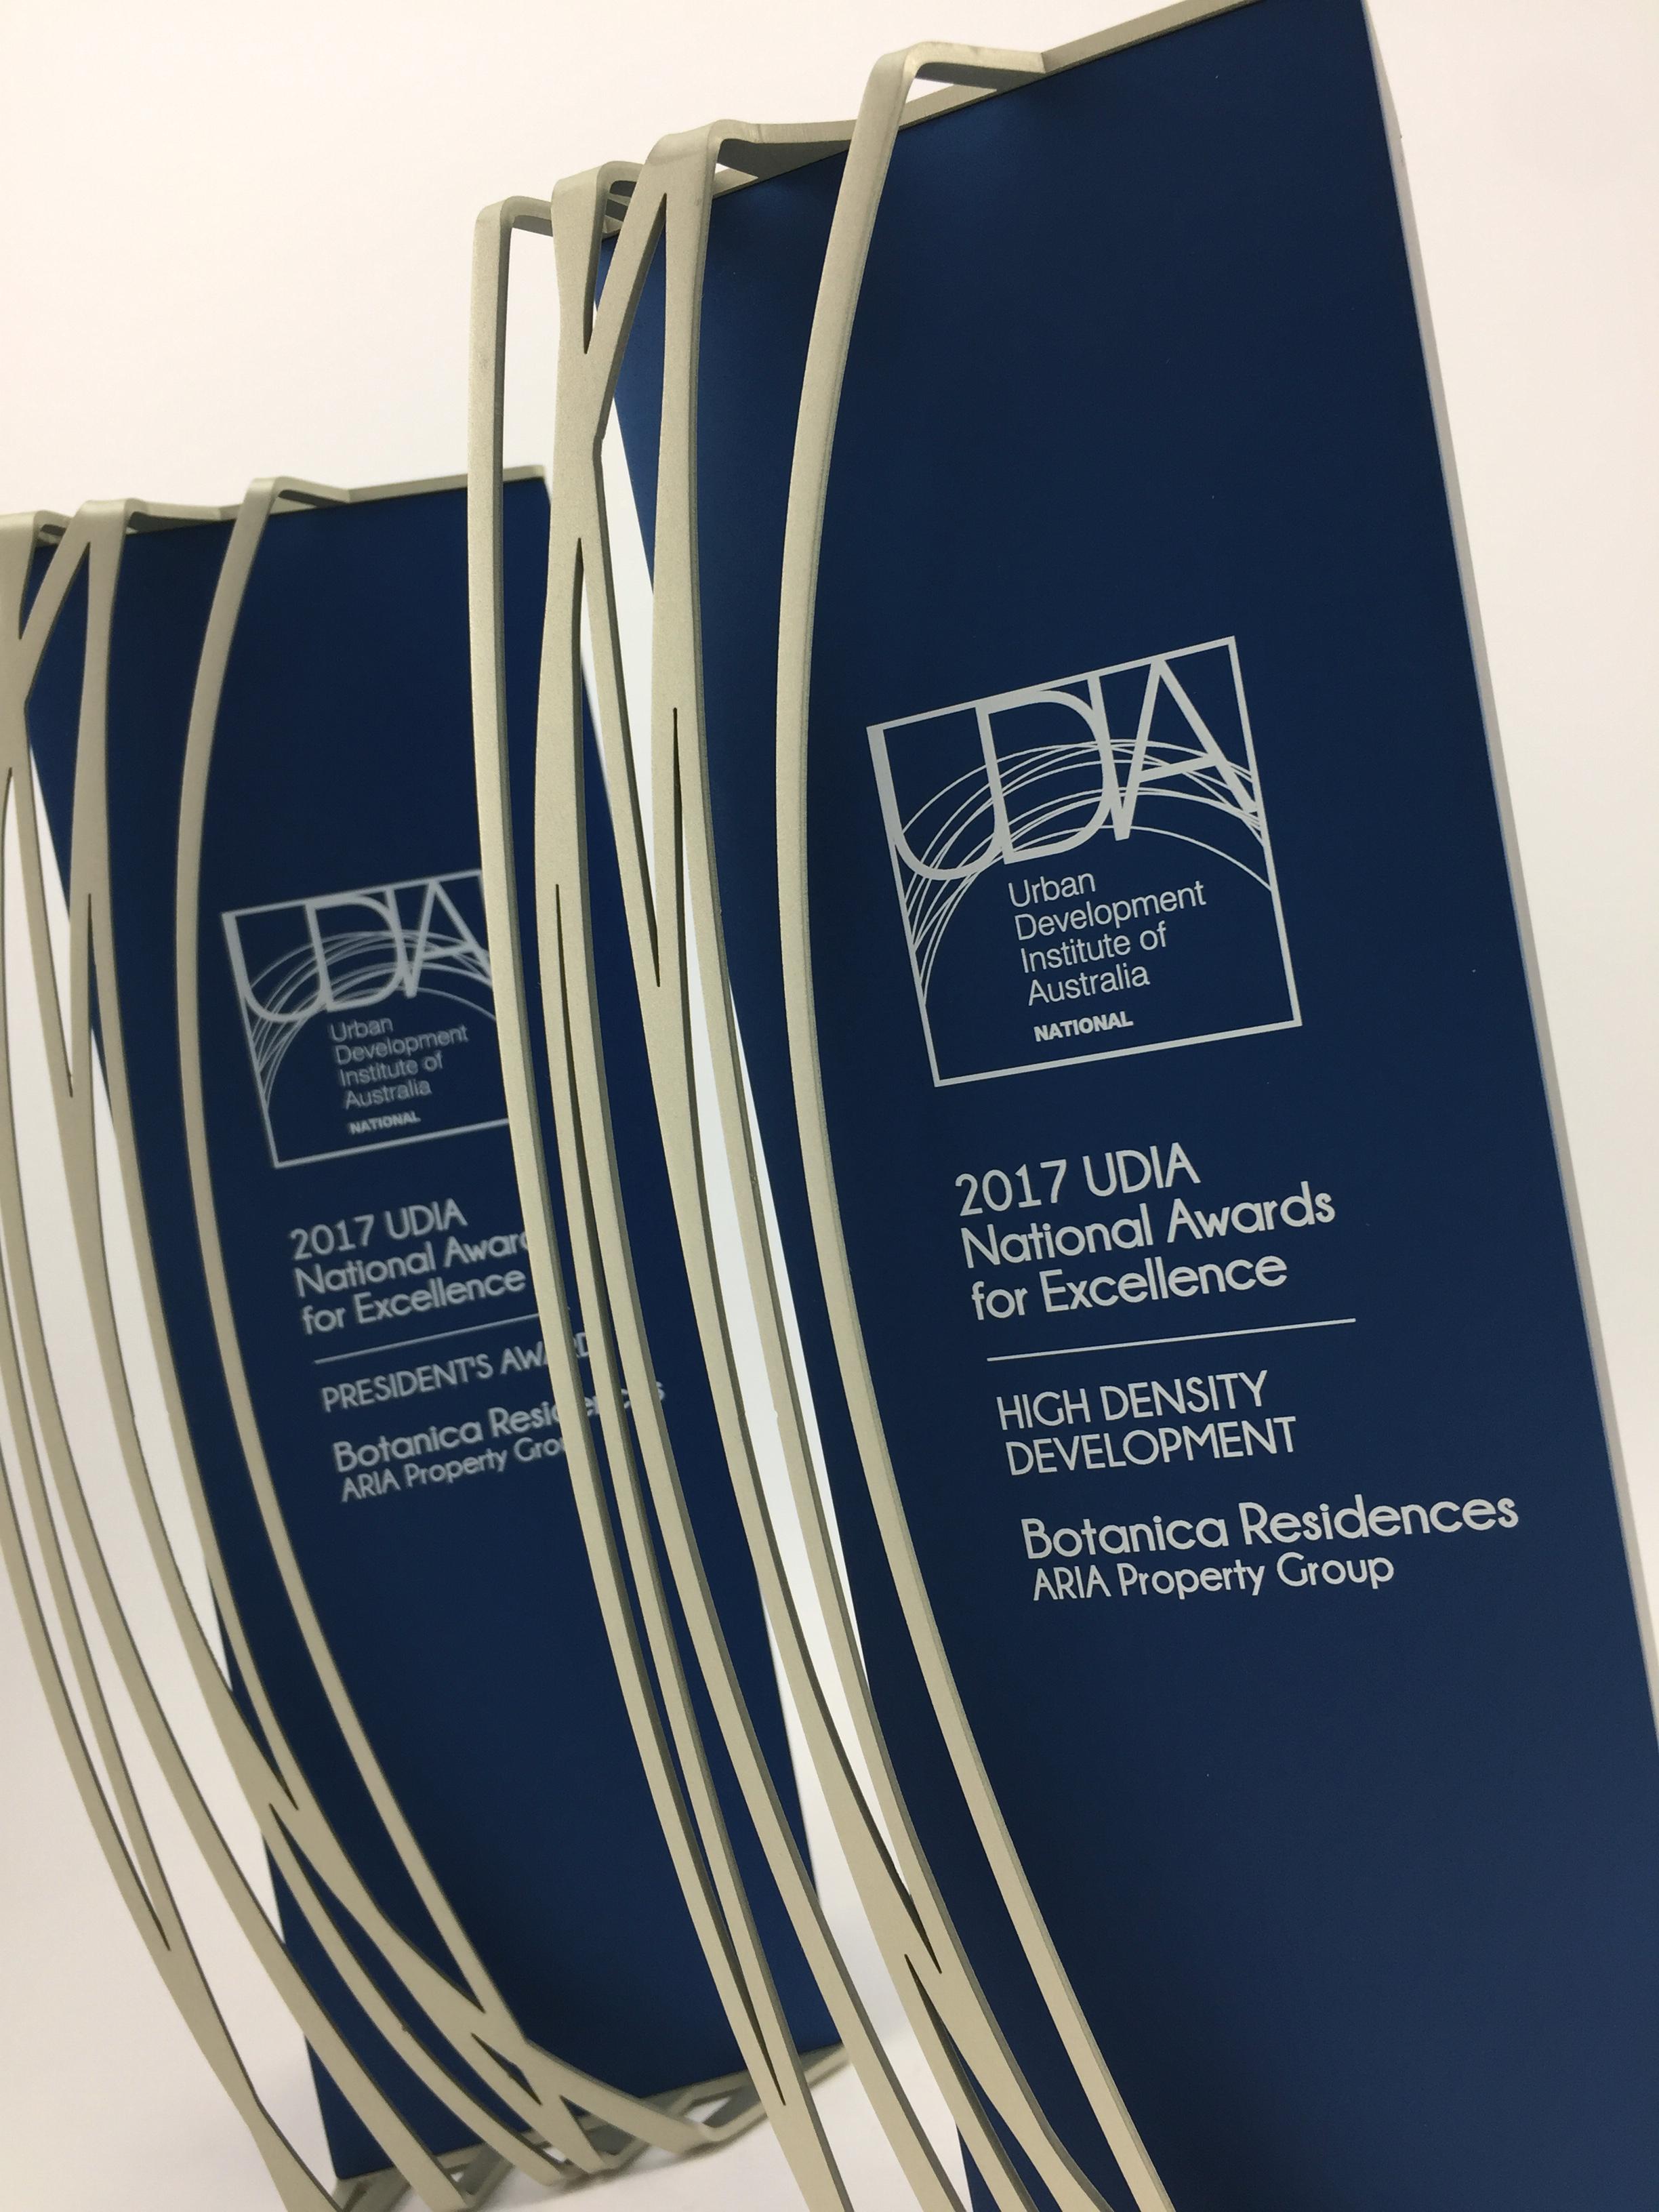 udia-national-awards-aluminium-trophy-03.jpg